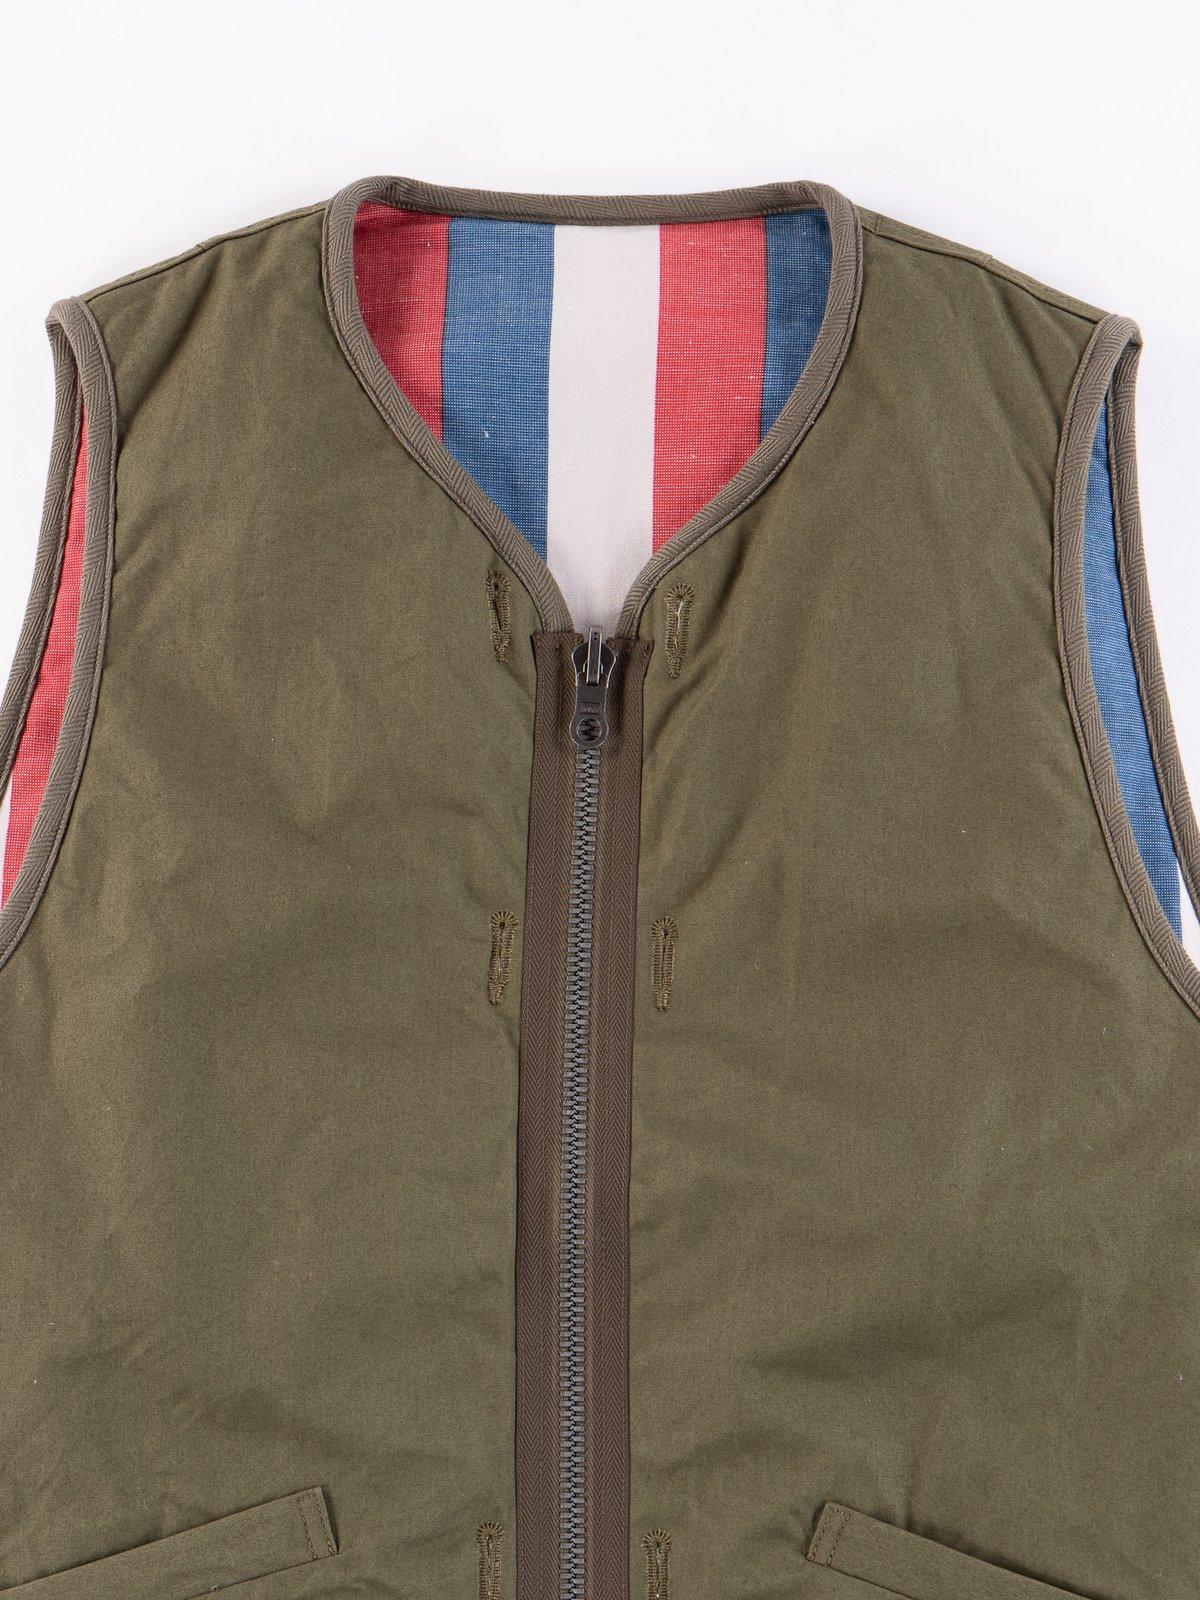 Olive Iris Cotton Liner Vest - Image 3